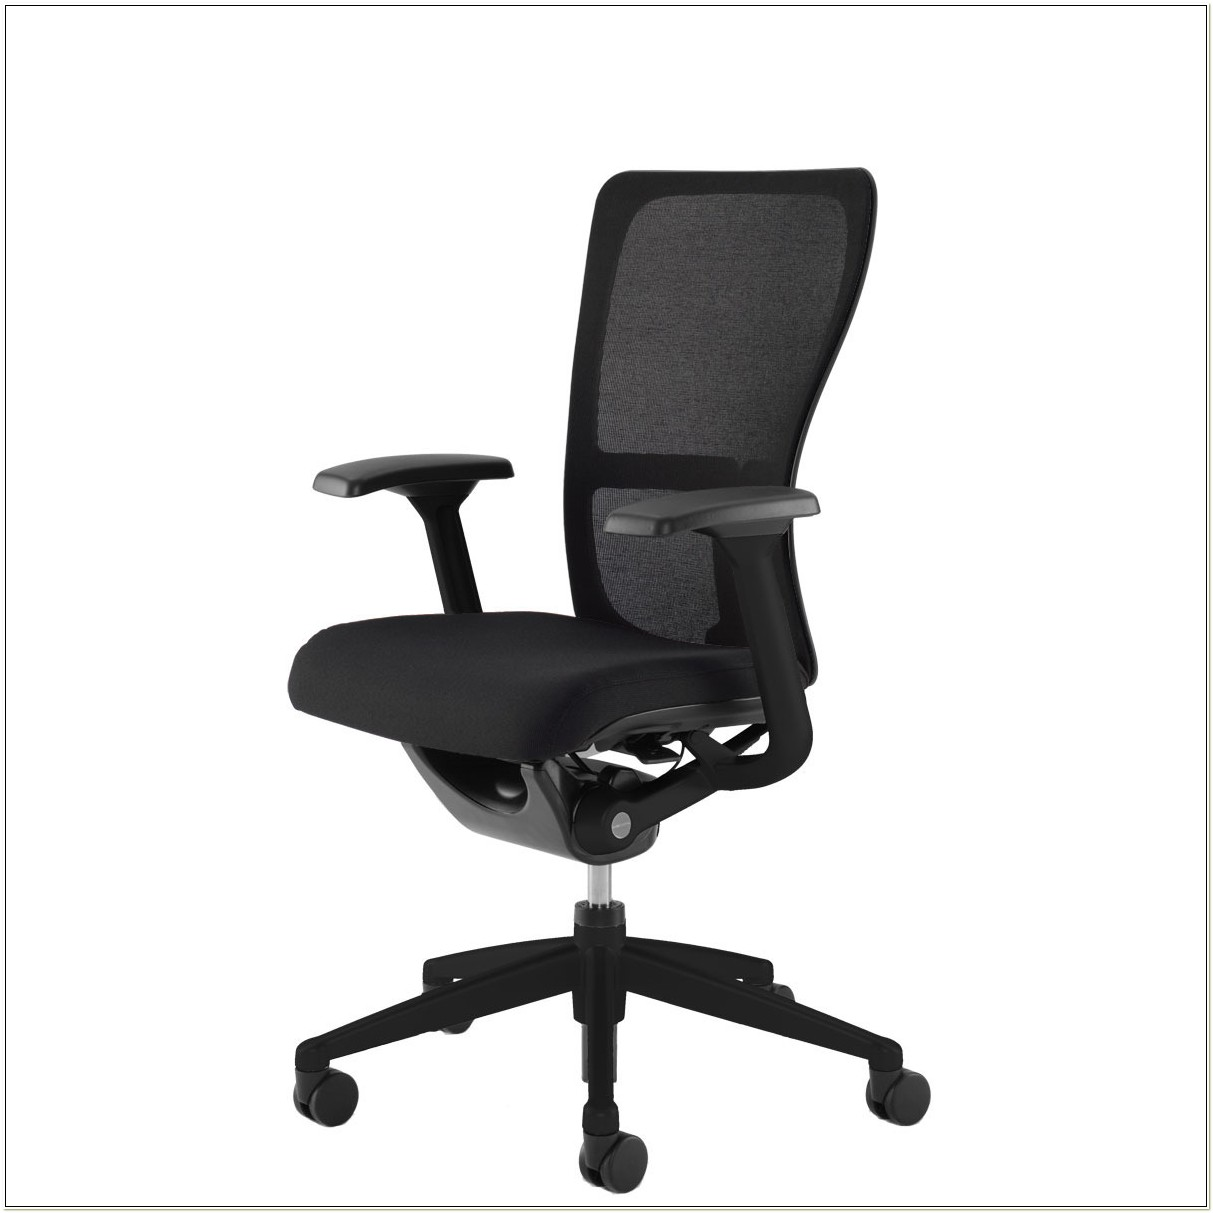 Zody Armless Chair By Haworth